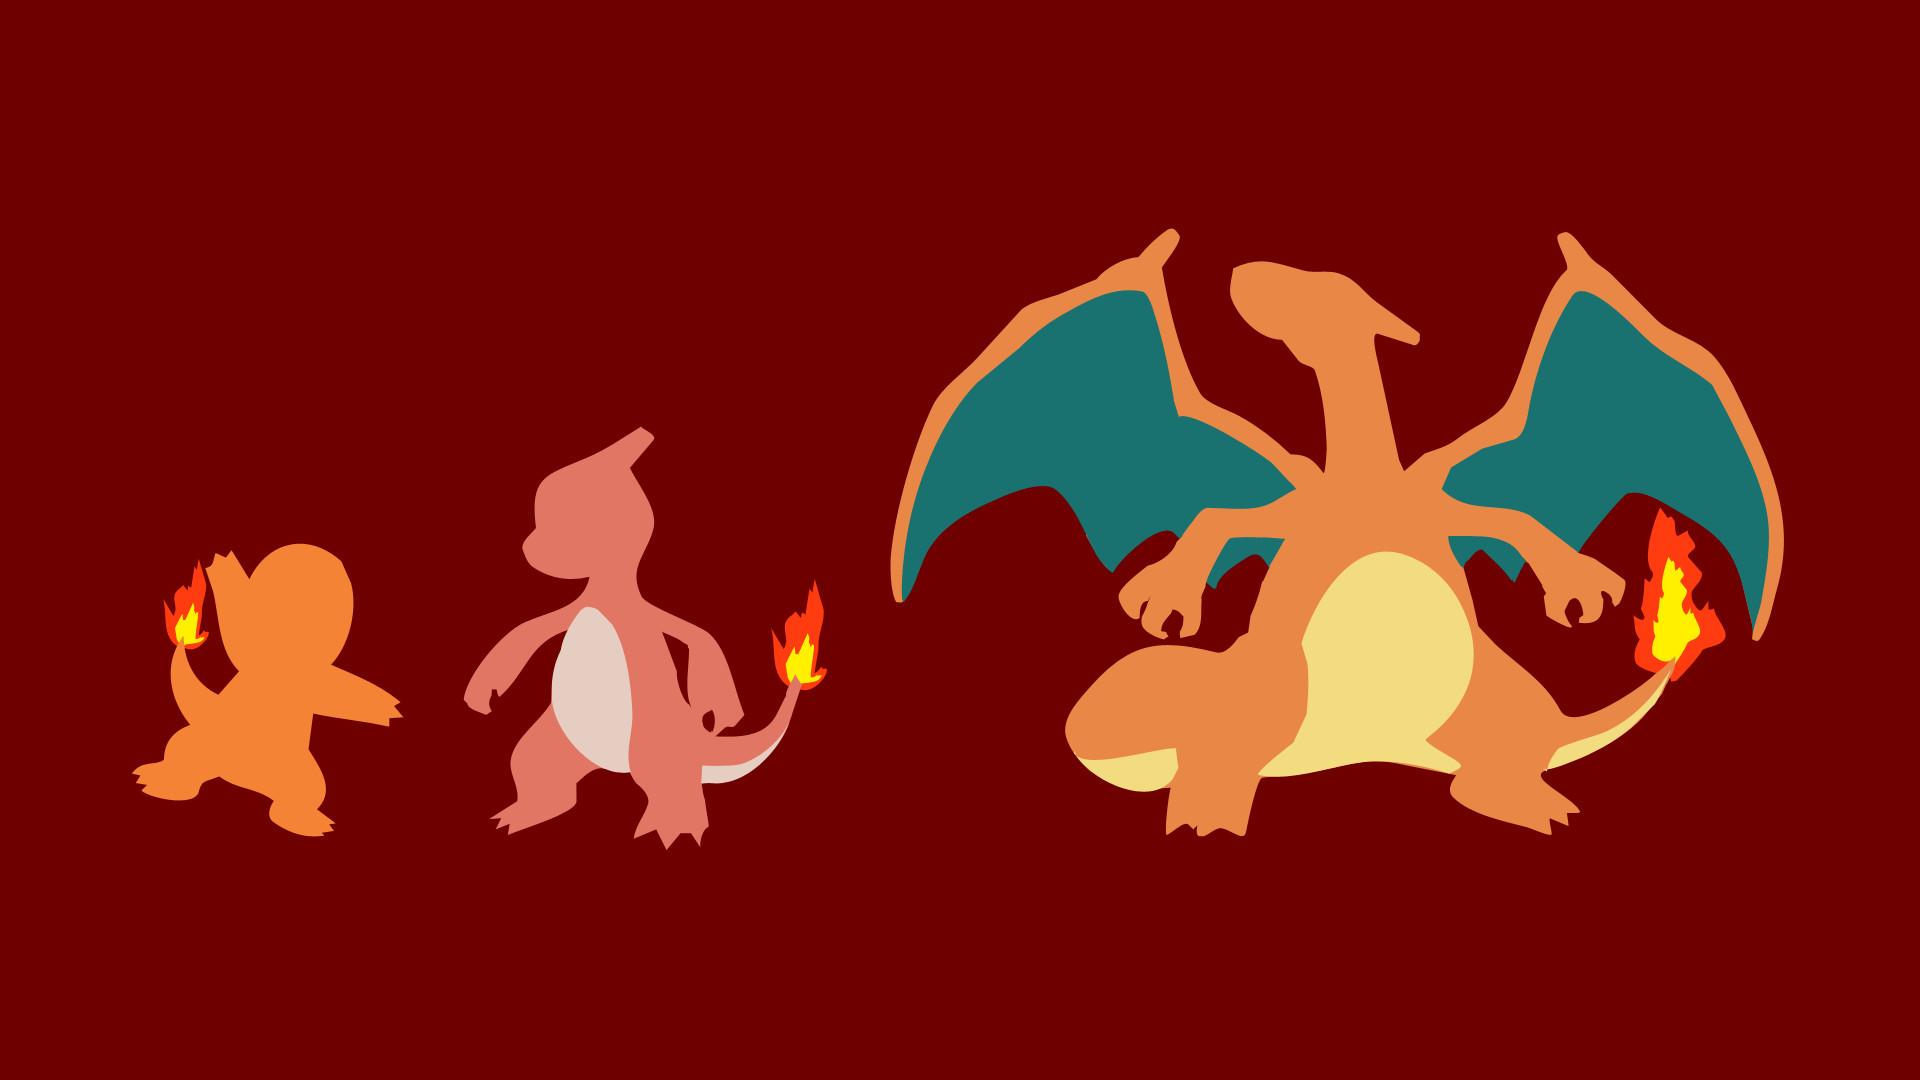 Res: 1920x1080, Pokemon Charizard HD Background.